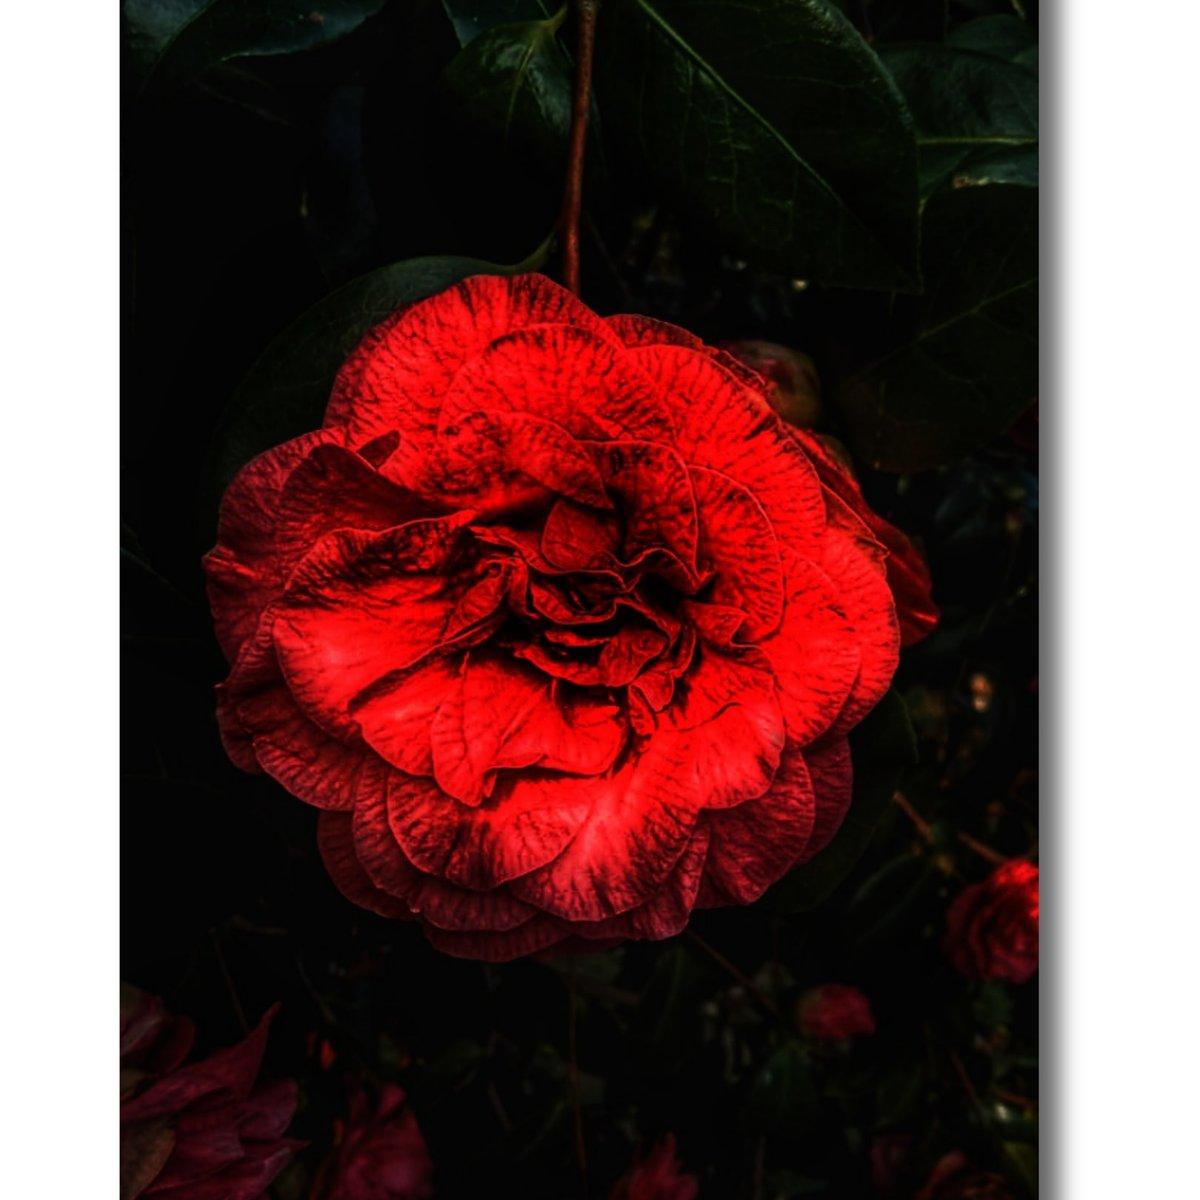 """Life is theflowerfor which love is the honey."" #flower #Flowergardenpic.twitter.com/q6i2nTLbYt"